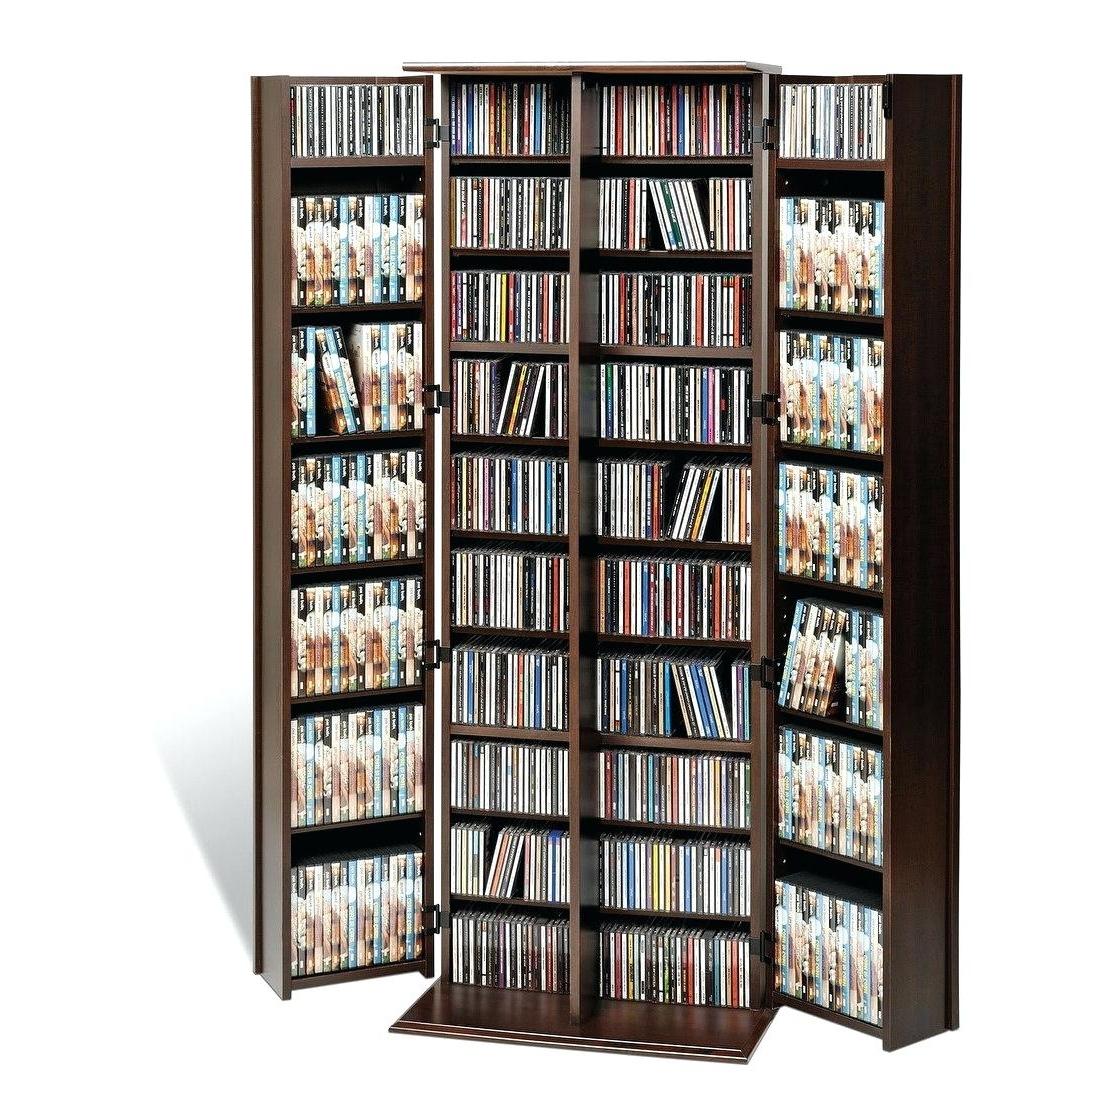 Fashionable Dvd Bookcases Regarding Dvd Bookcase Dvd Holder Plans Dvd Organizer Storage (View 14 of 15)